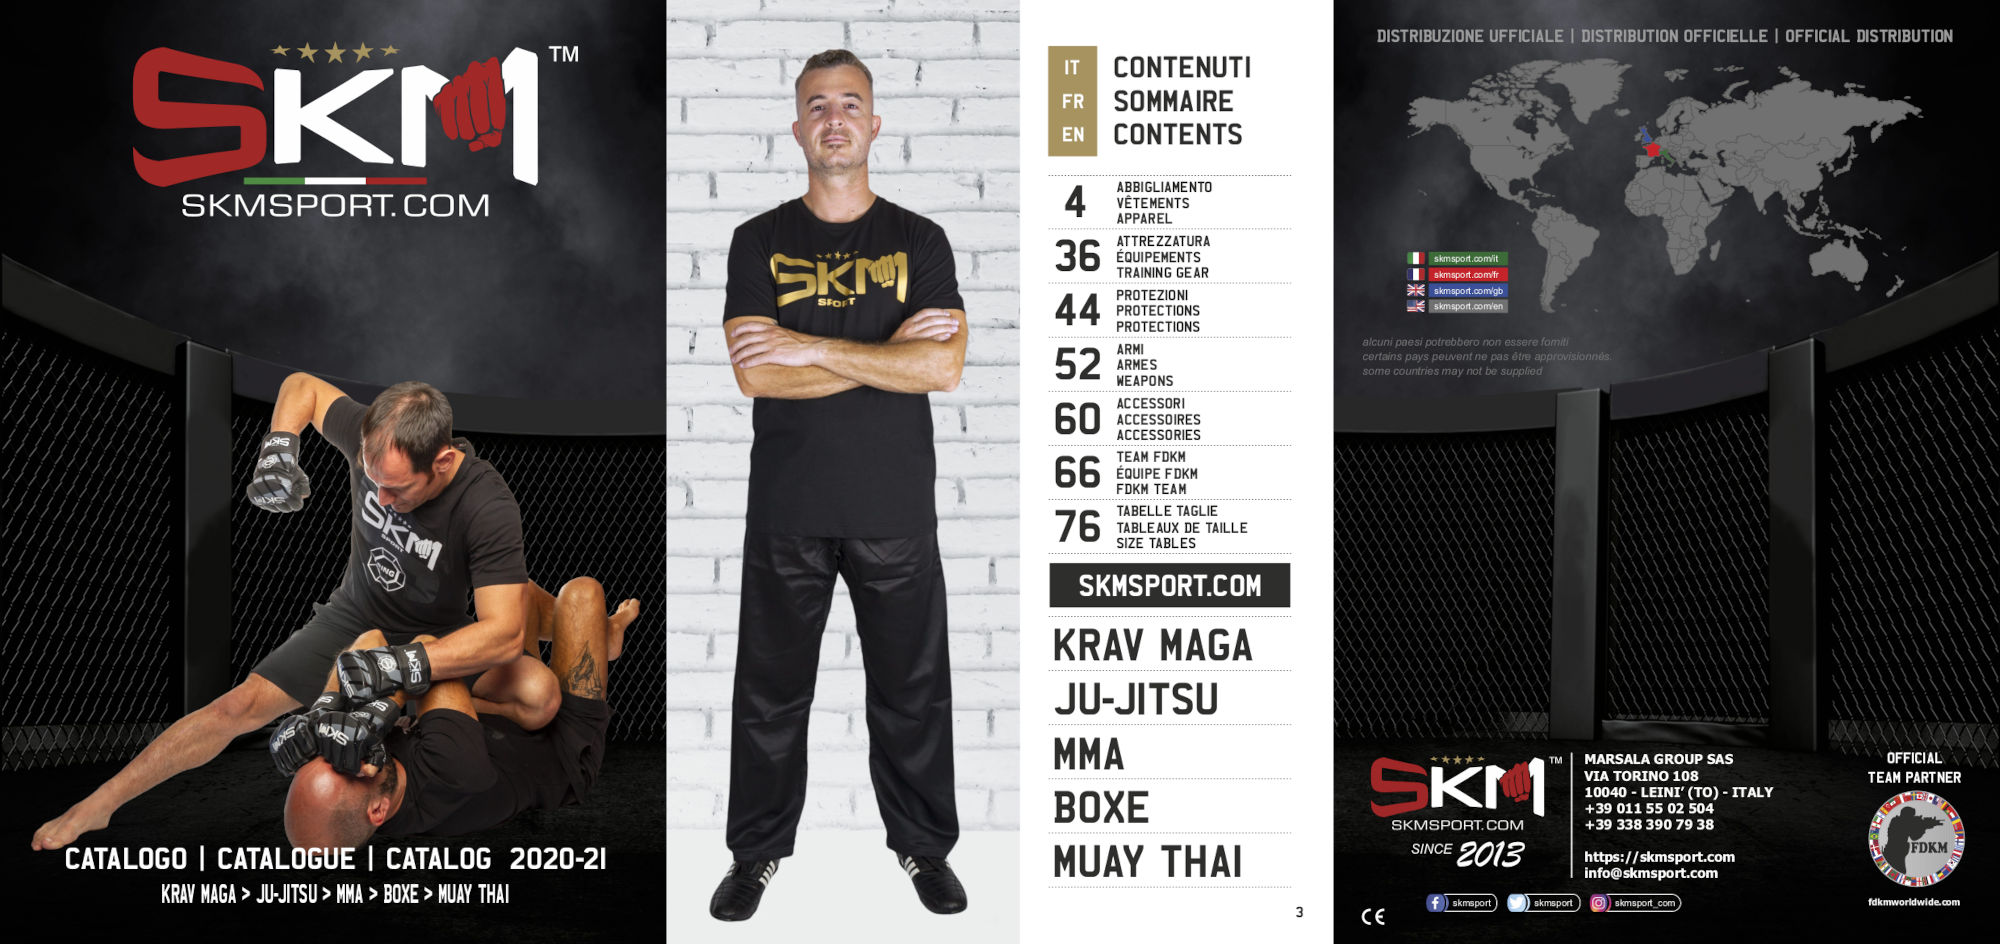 catalogo skm sport 2020-21 copertina